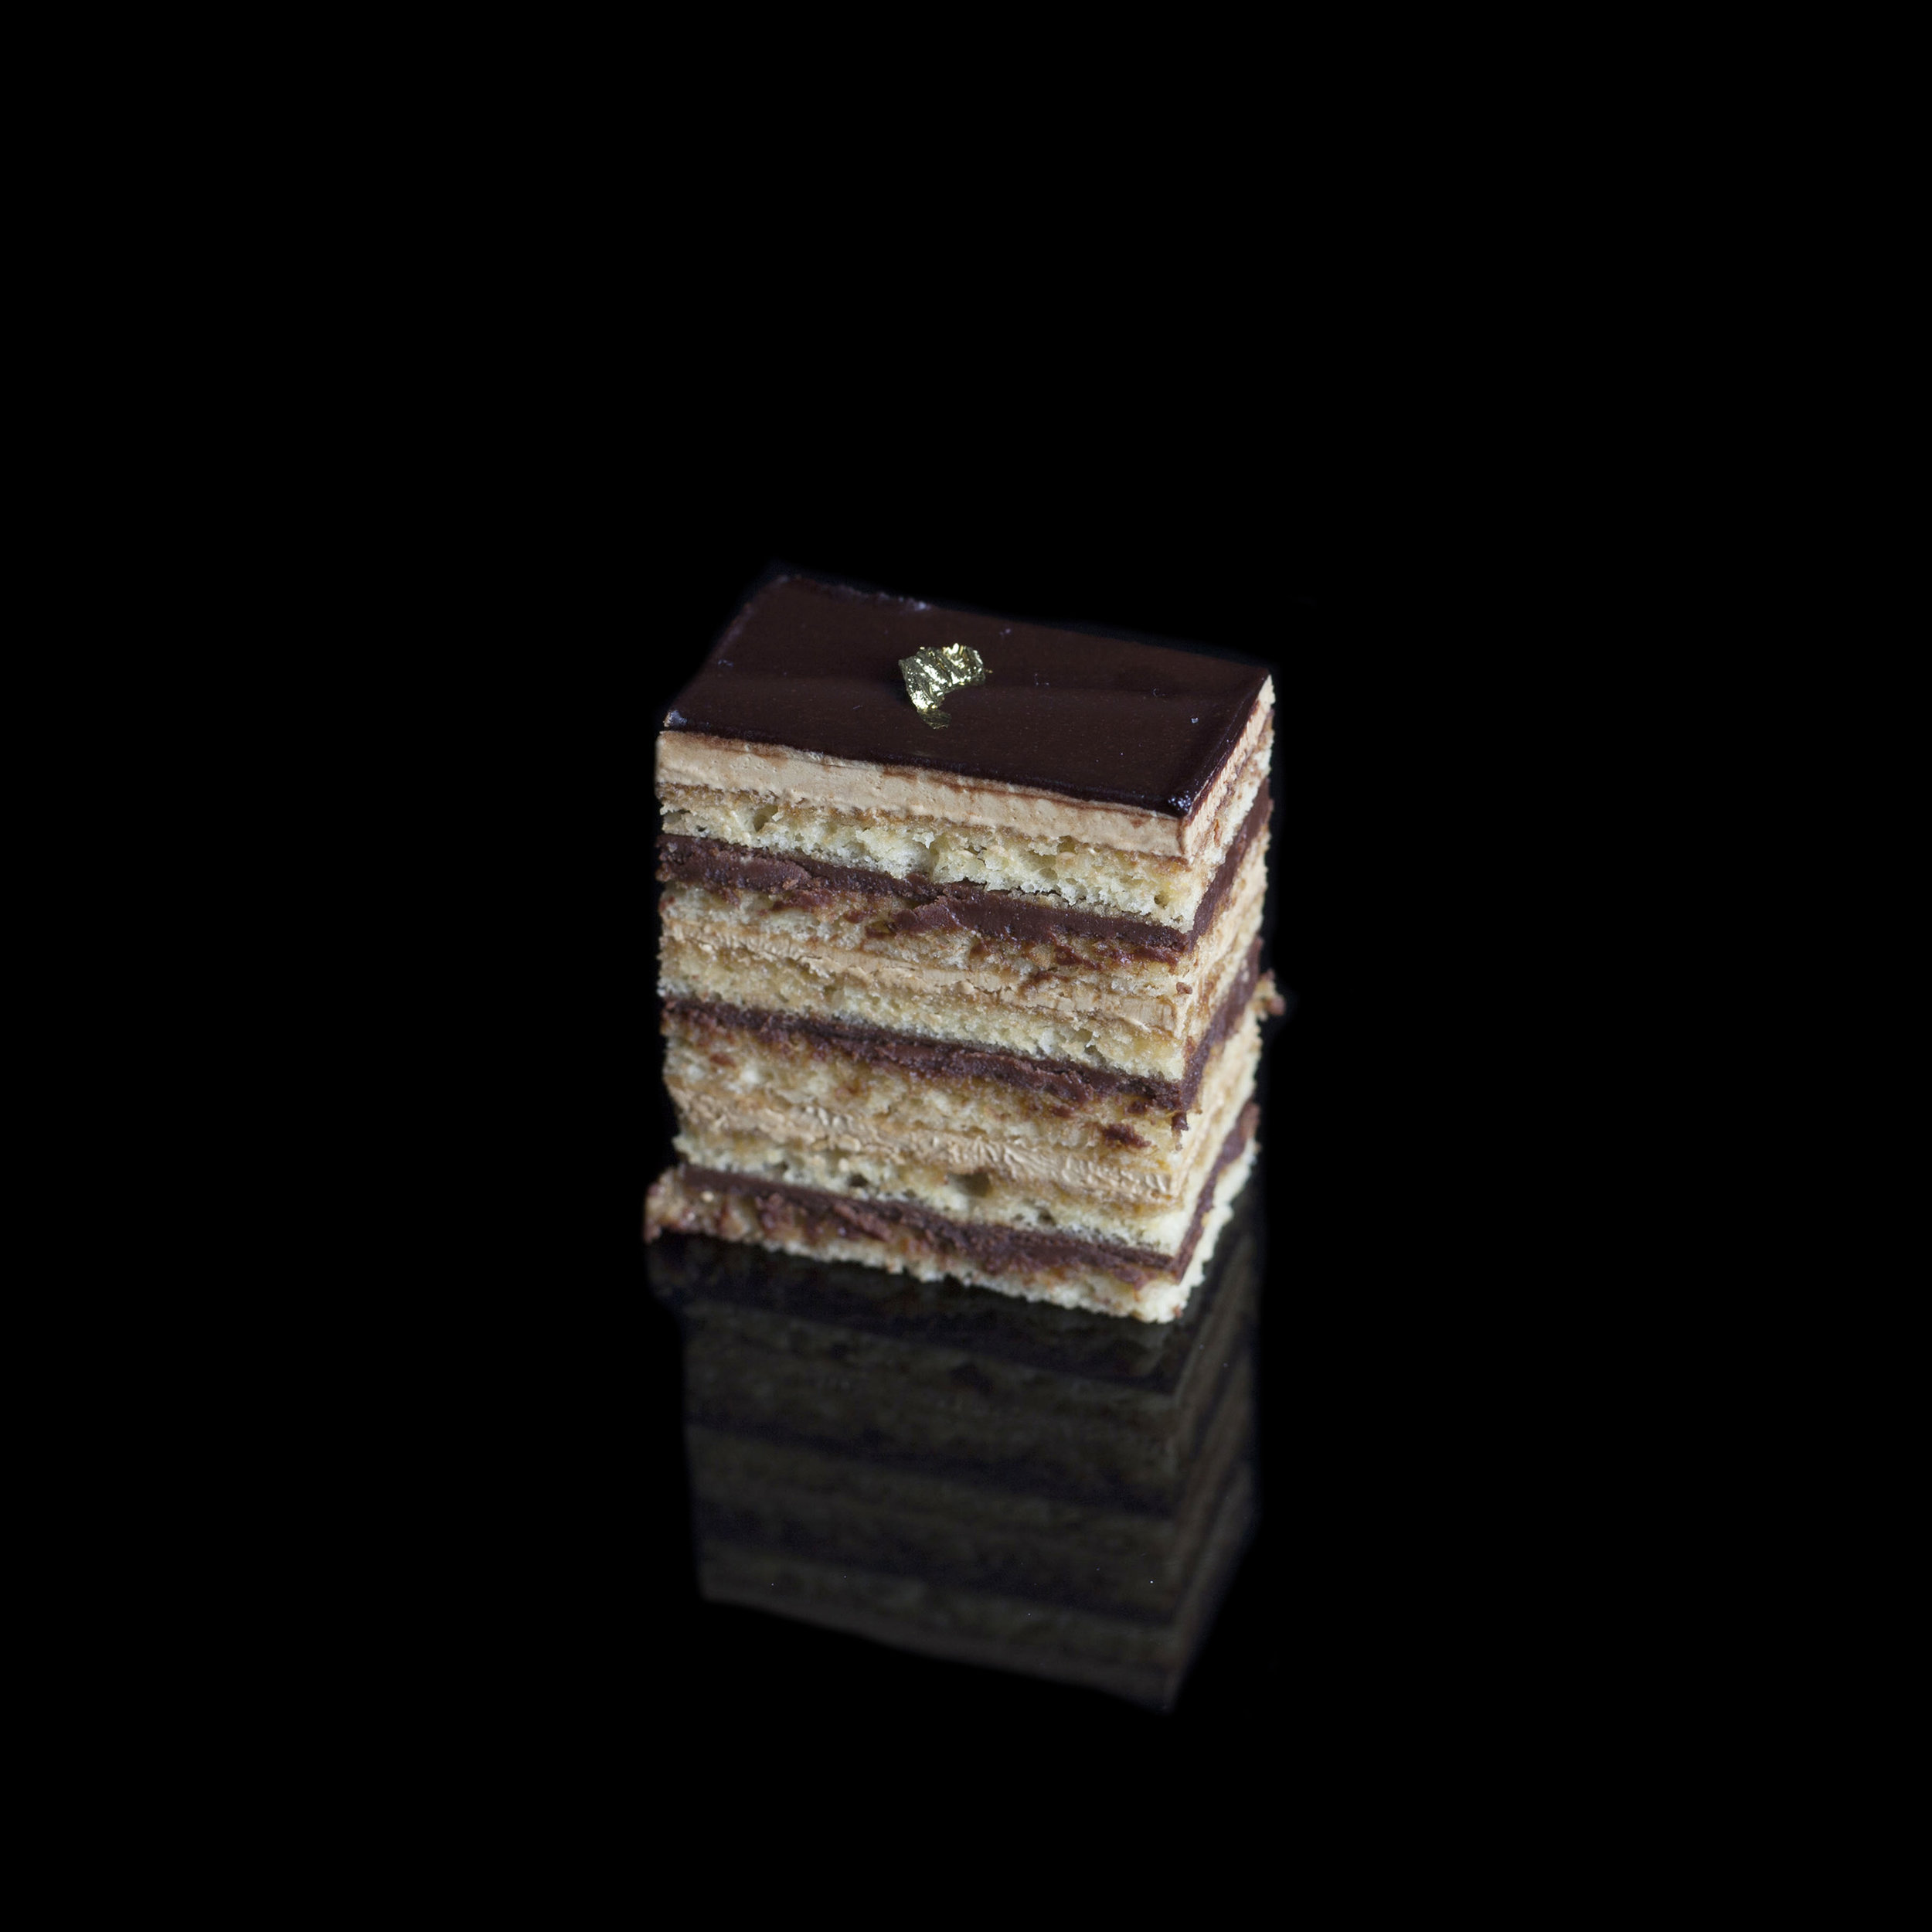 Copy of Copy of Opera Cake (Chocolate & Coffee)